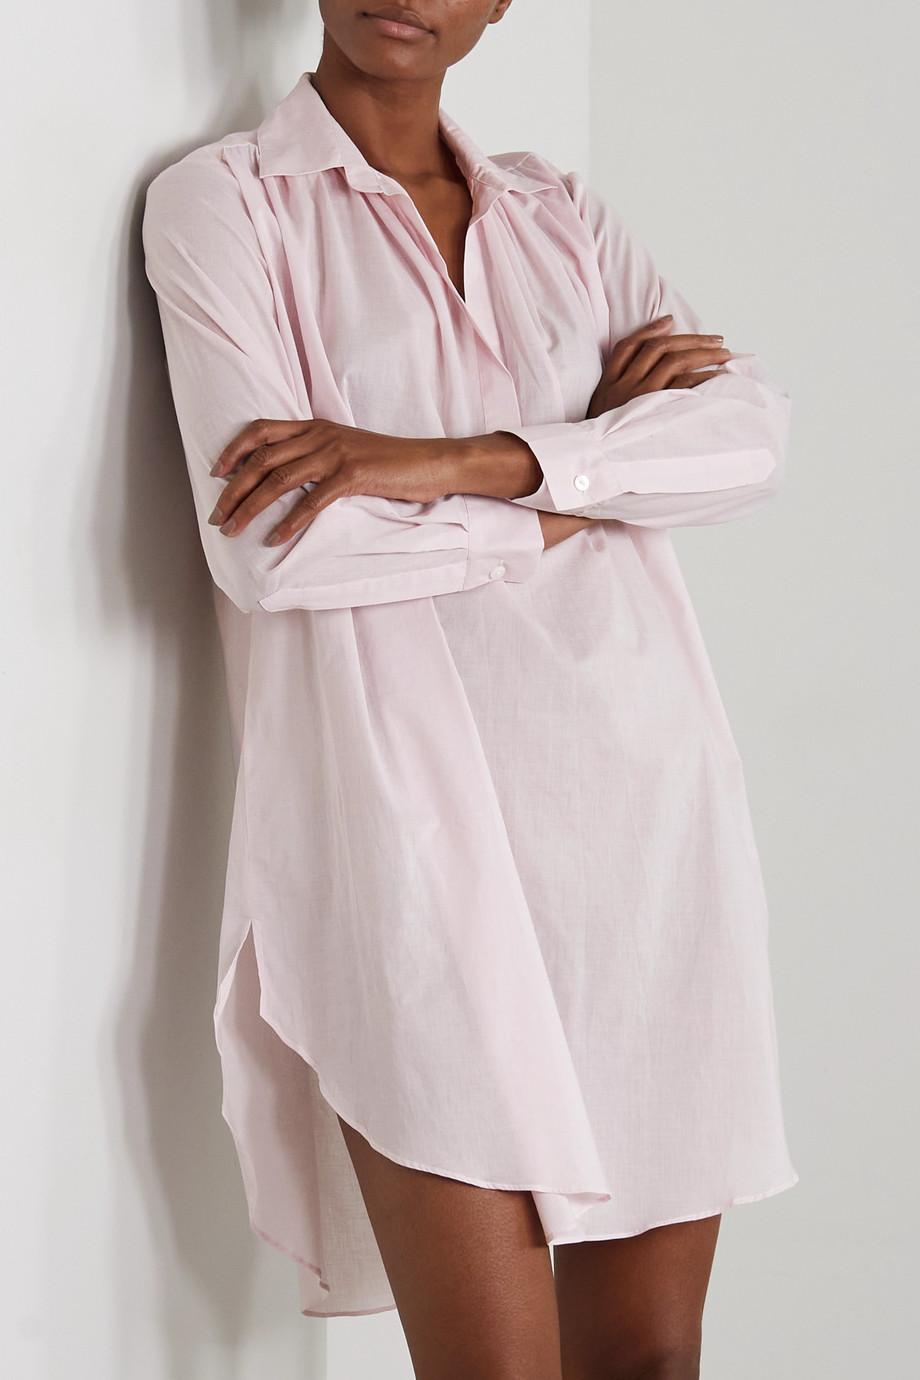 Pour Les Femmes Romeo Nachthemd aus Baumwoll-Voile